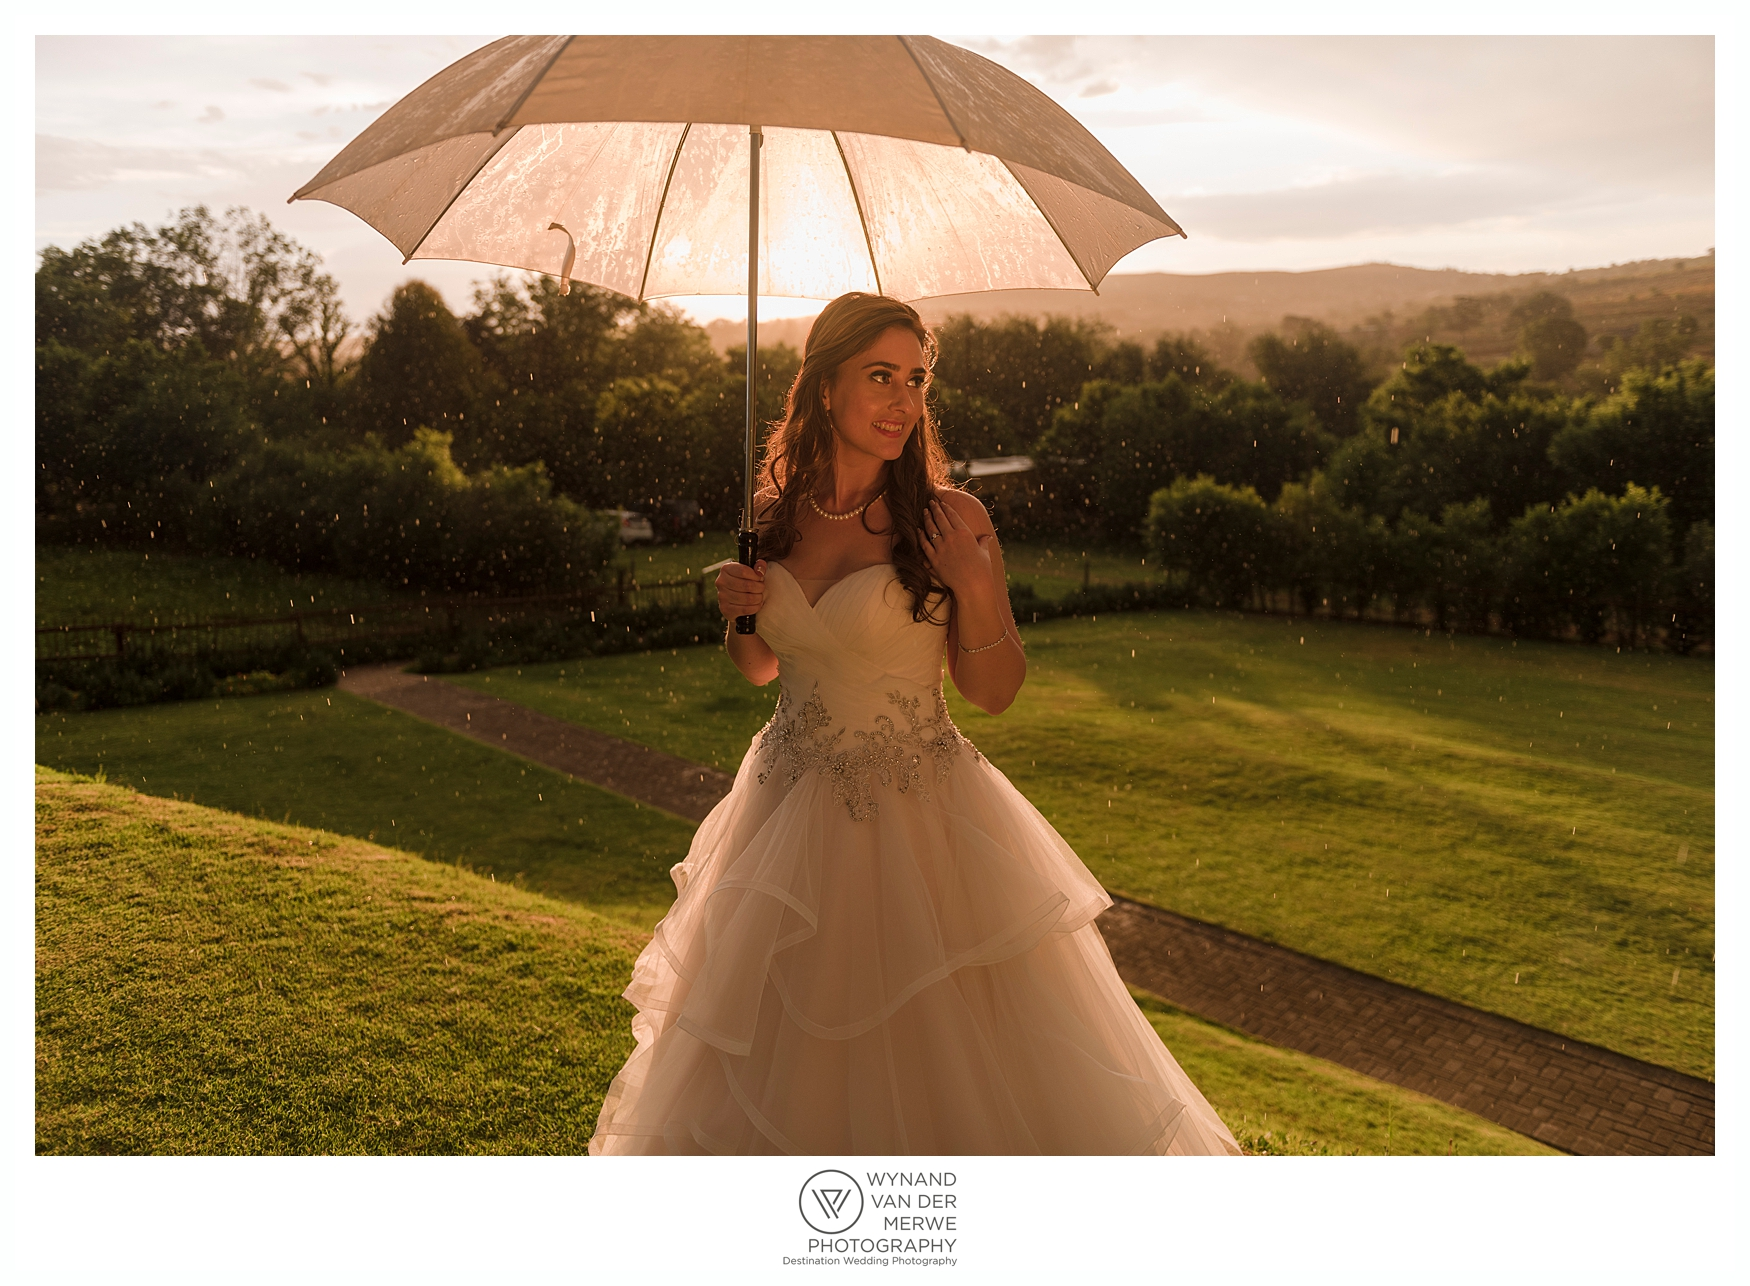 Wynandvandermerwe ryan natalia wedding photography cradle valley guesthouse gauteng-491.jpg